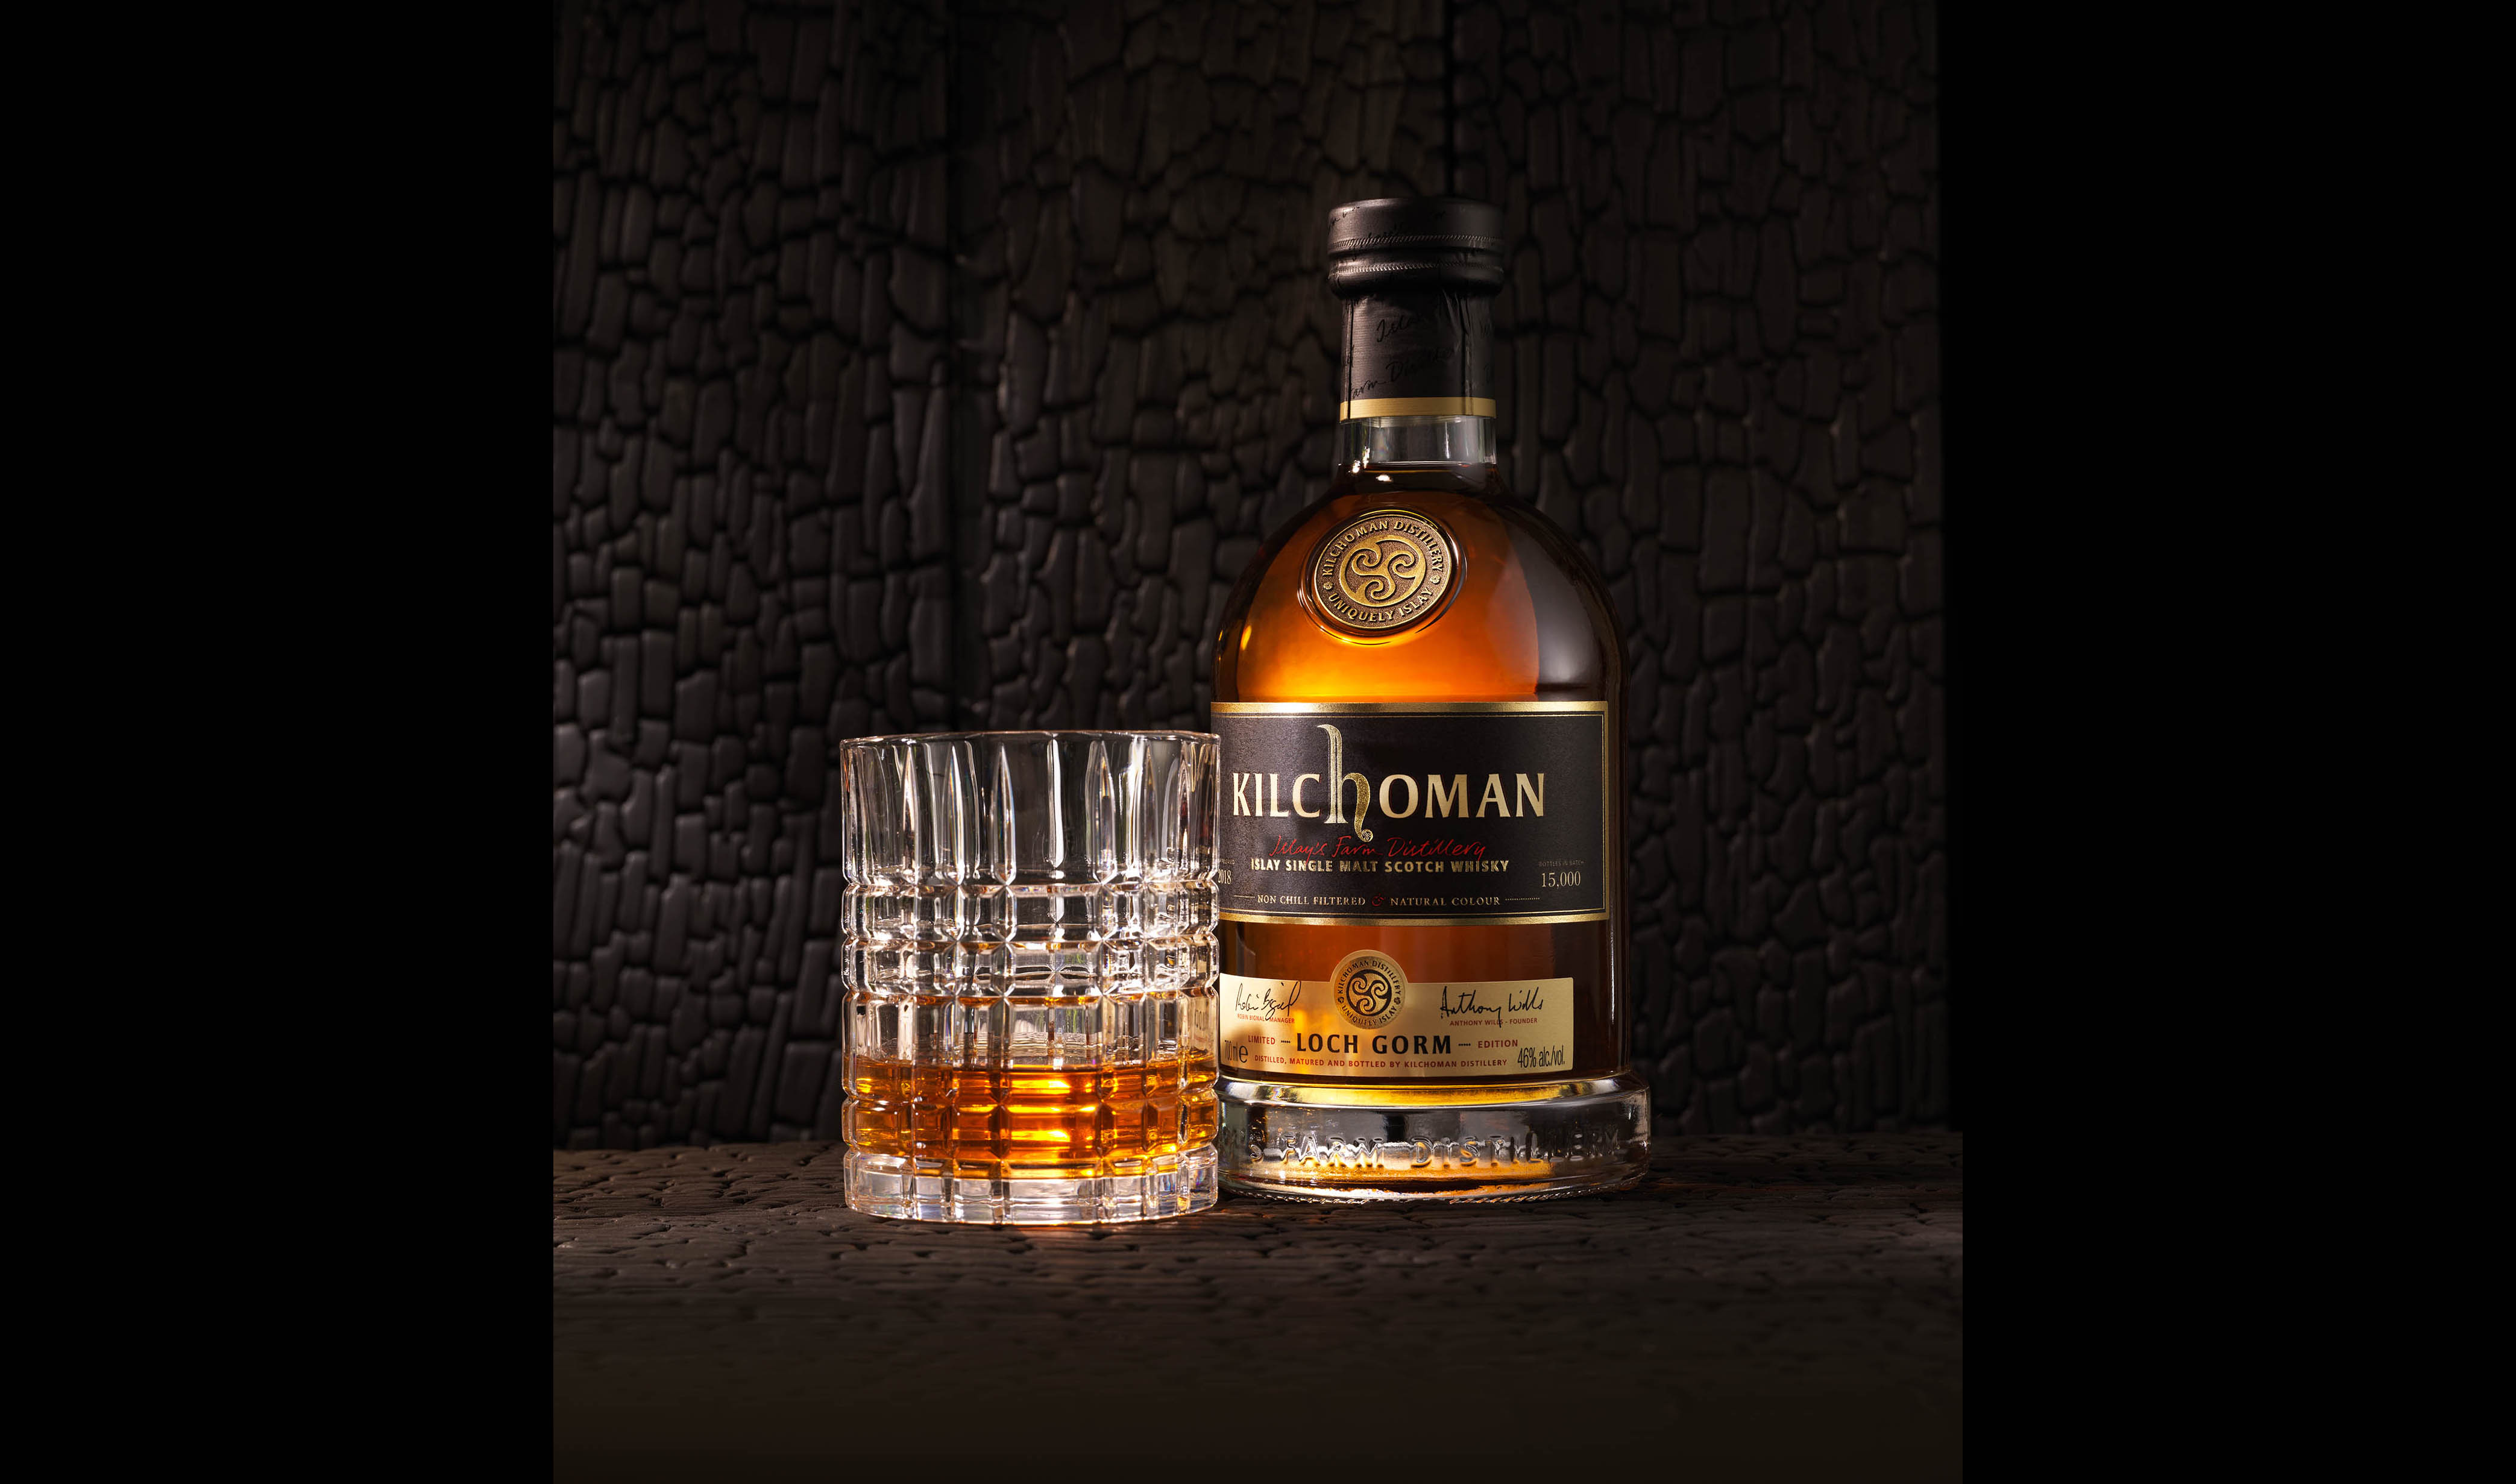 https://crisp.cc/wp-content/uploads/2018/11/Kilchoman-Whisky-1.jpg